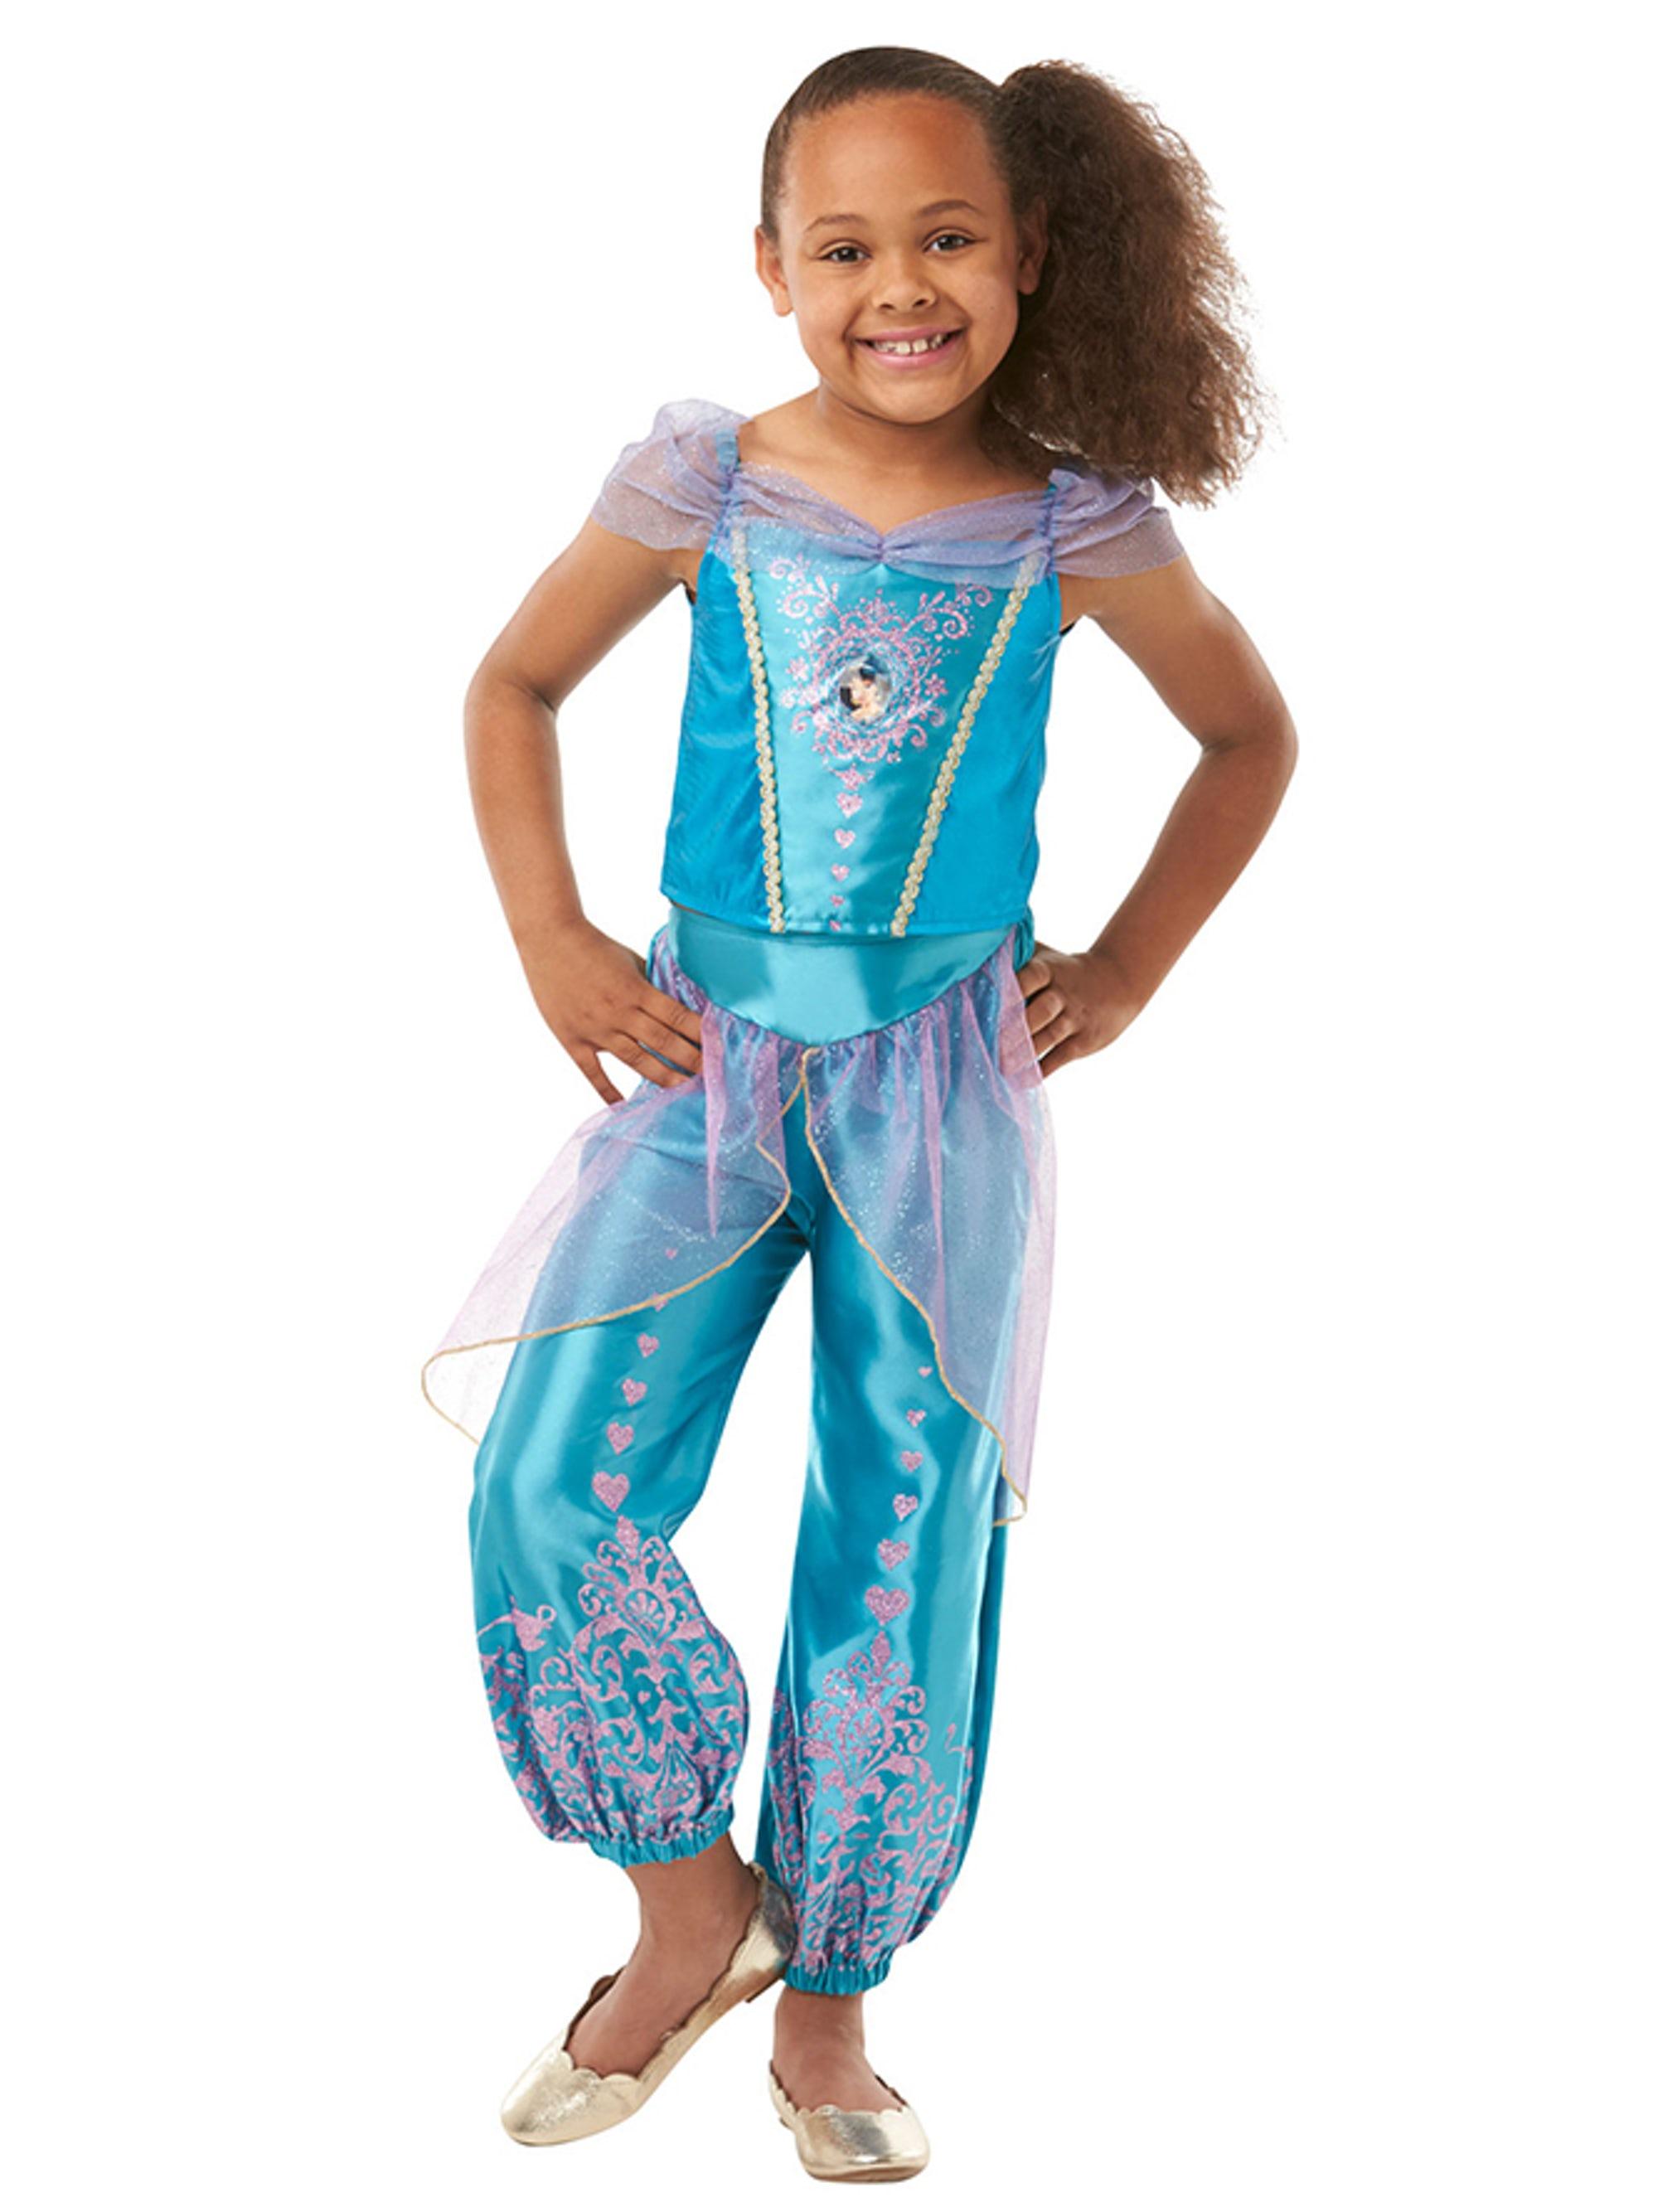 jasmin kostume til børn - Jasmin kostume til børn